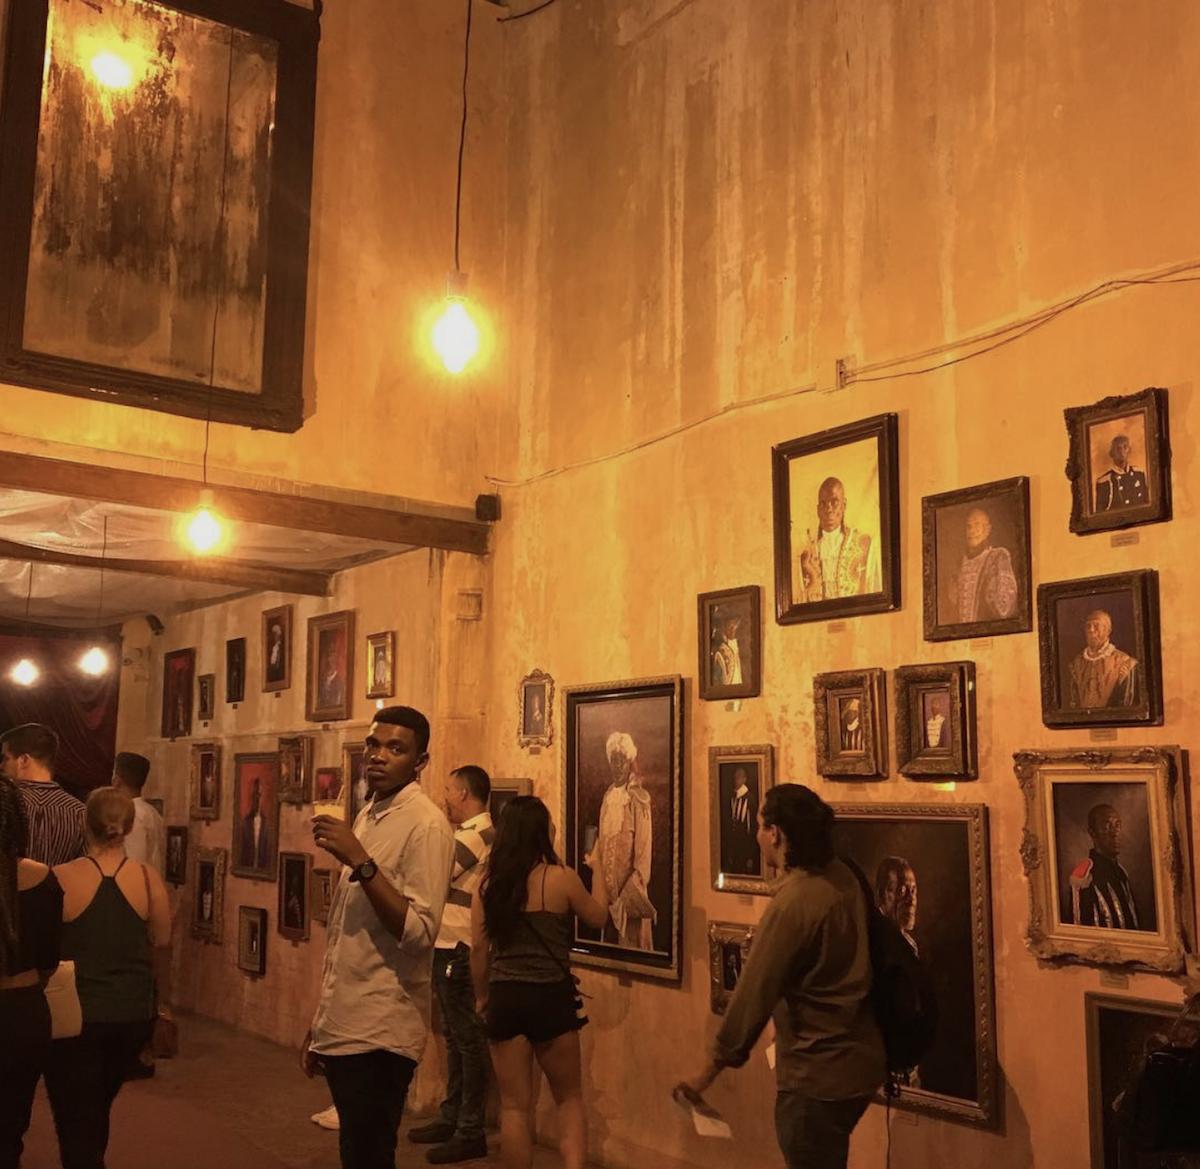 Rencontre Femme Cuba - Site de rencontre gratuit Cuba